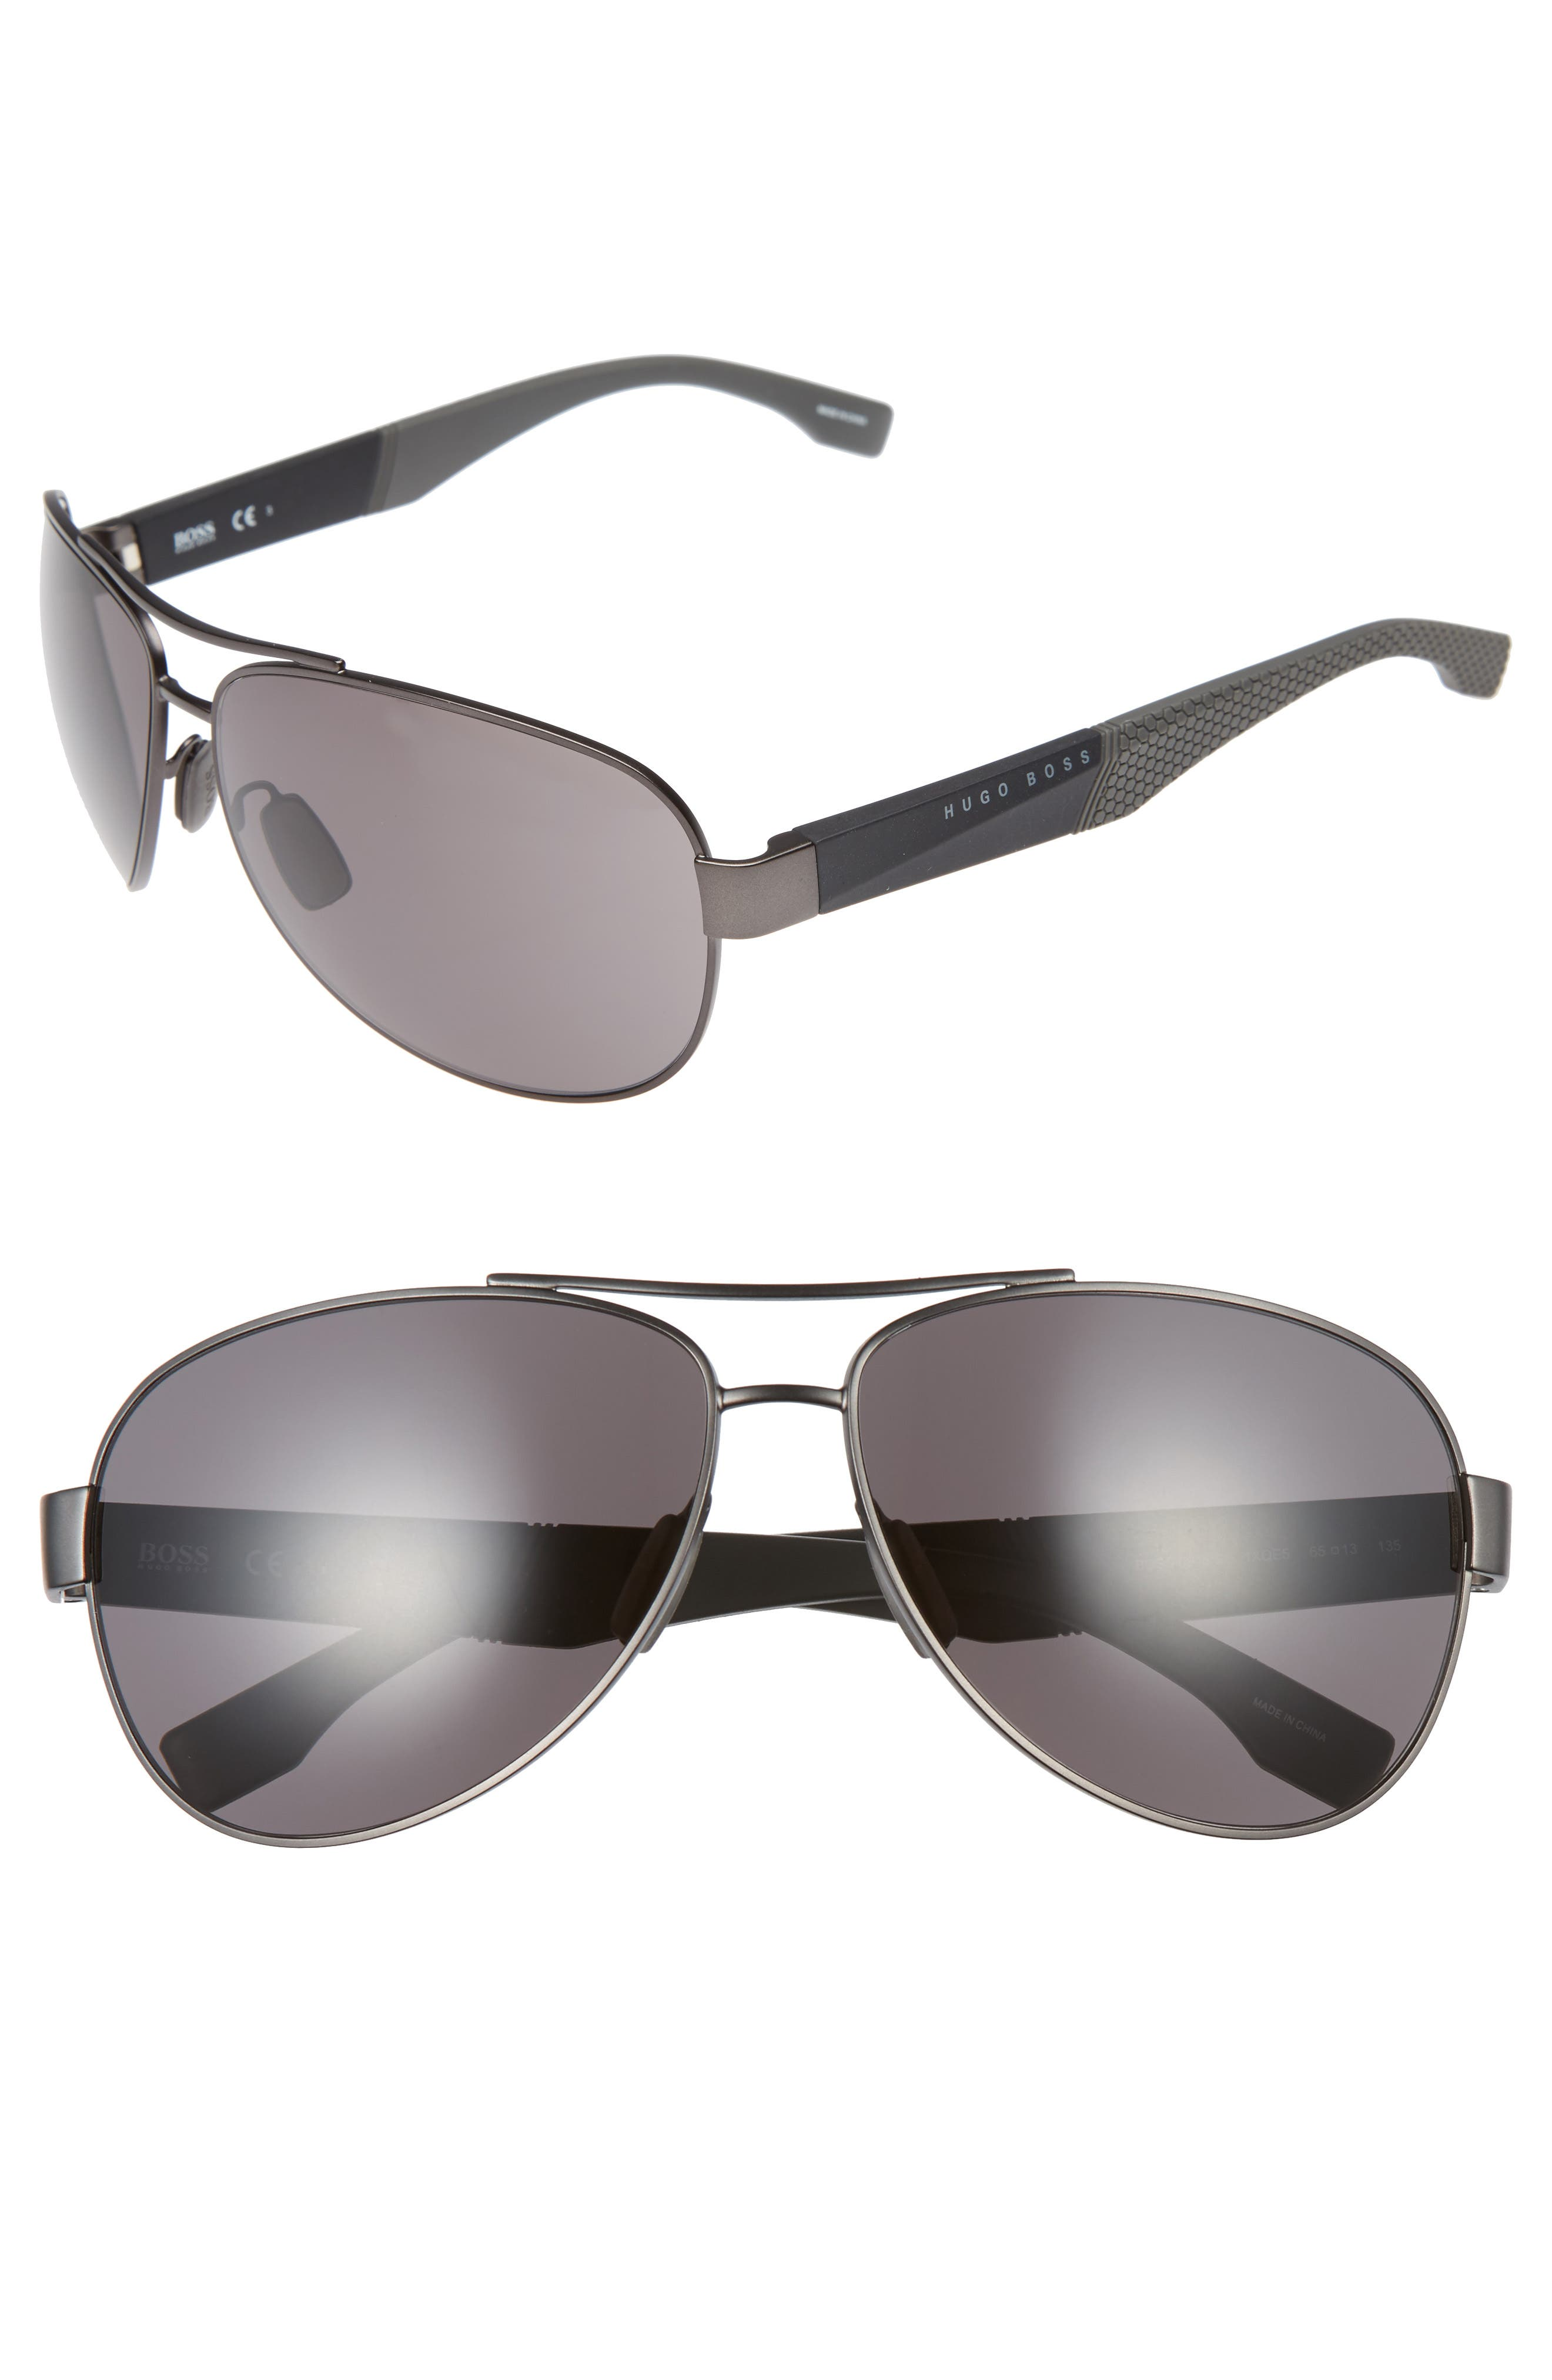 65mm Aviator Sunglasses,                             Main thumbnail 1, color,                             GREY BLACK/ GREY